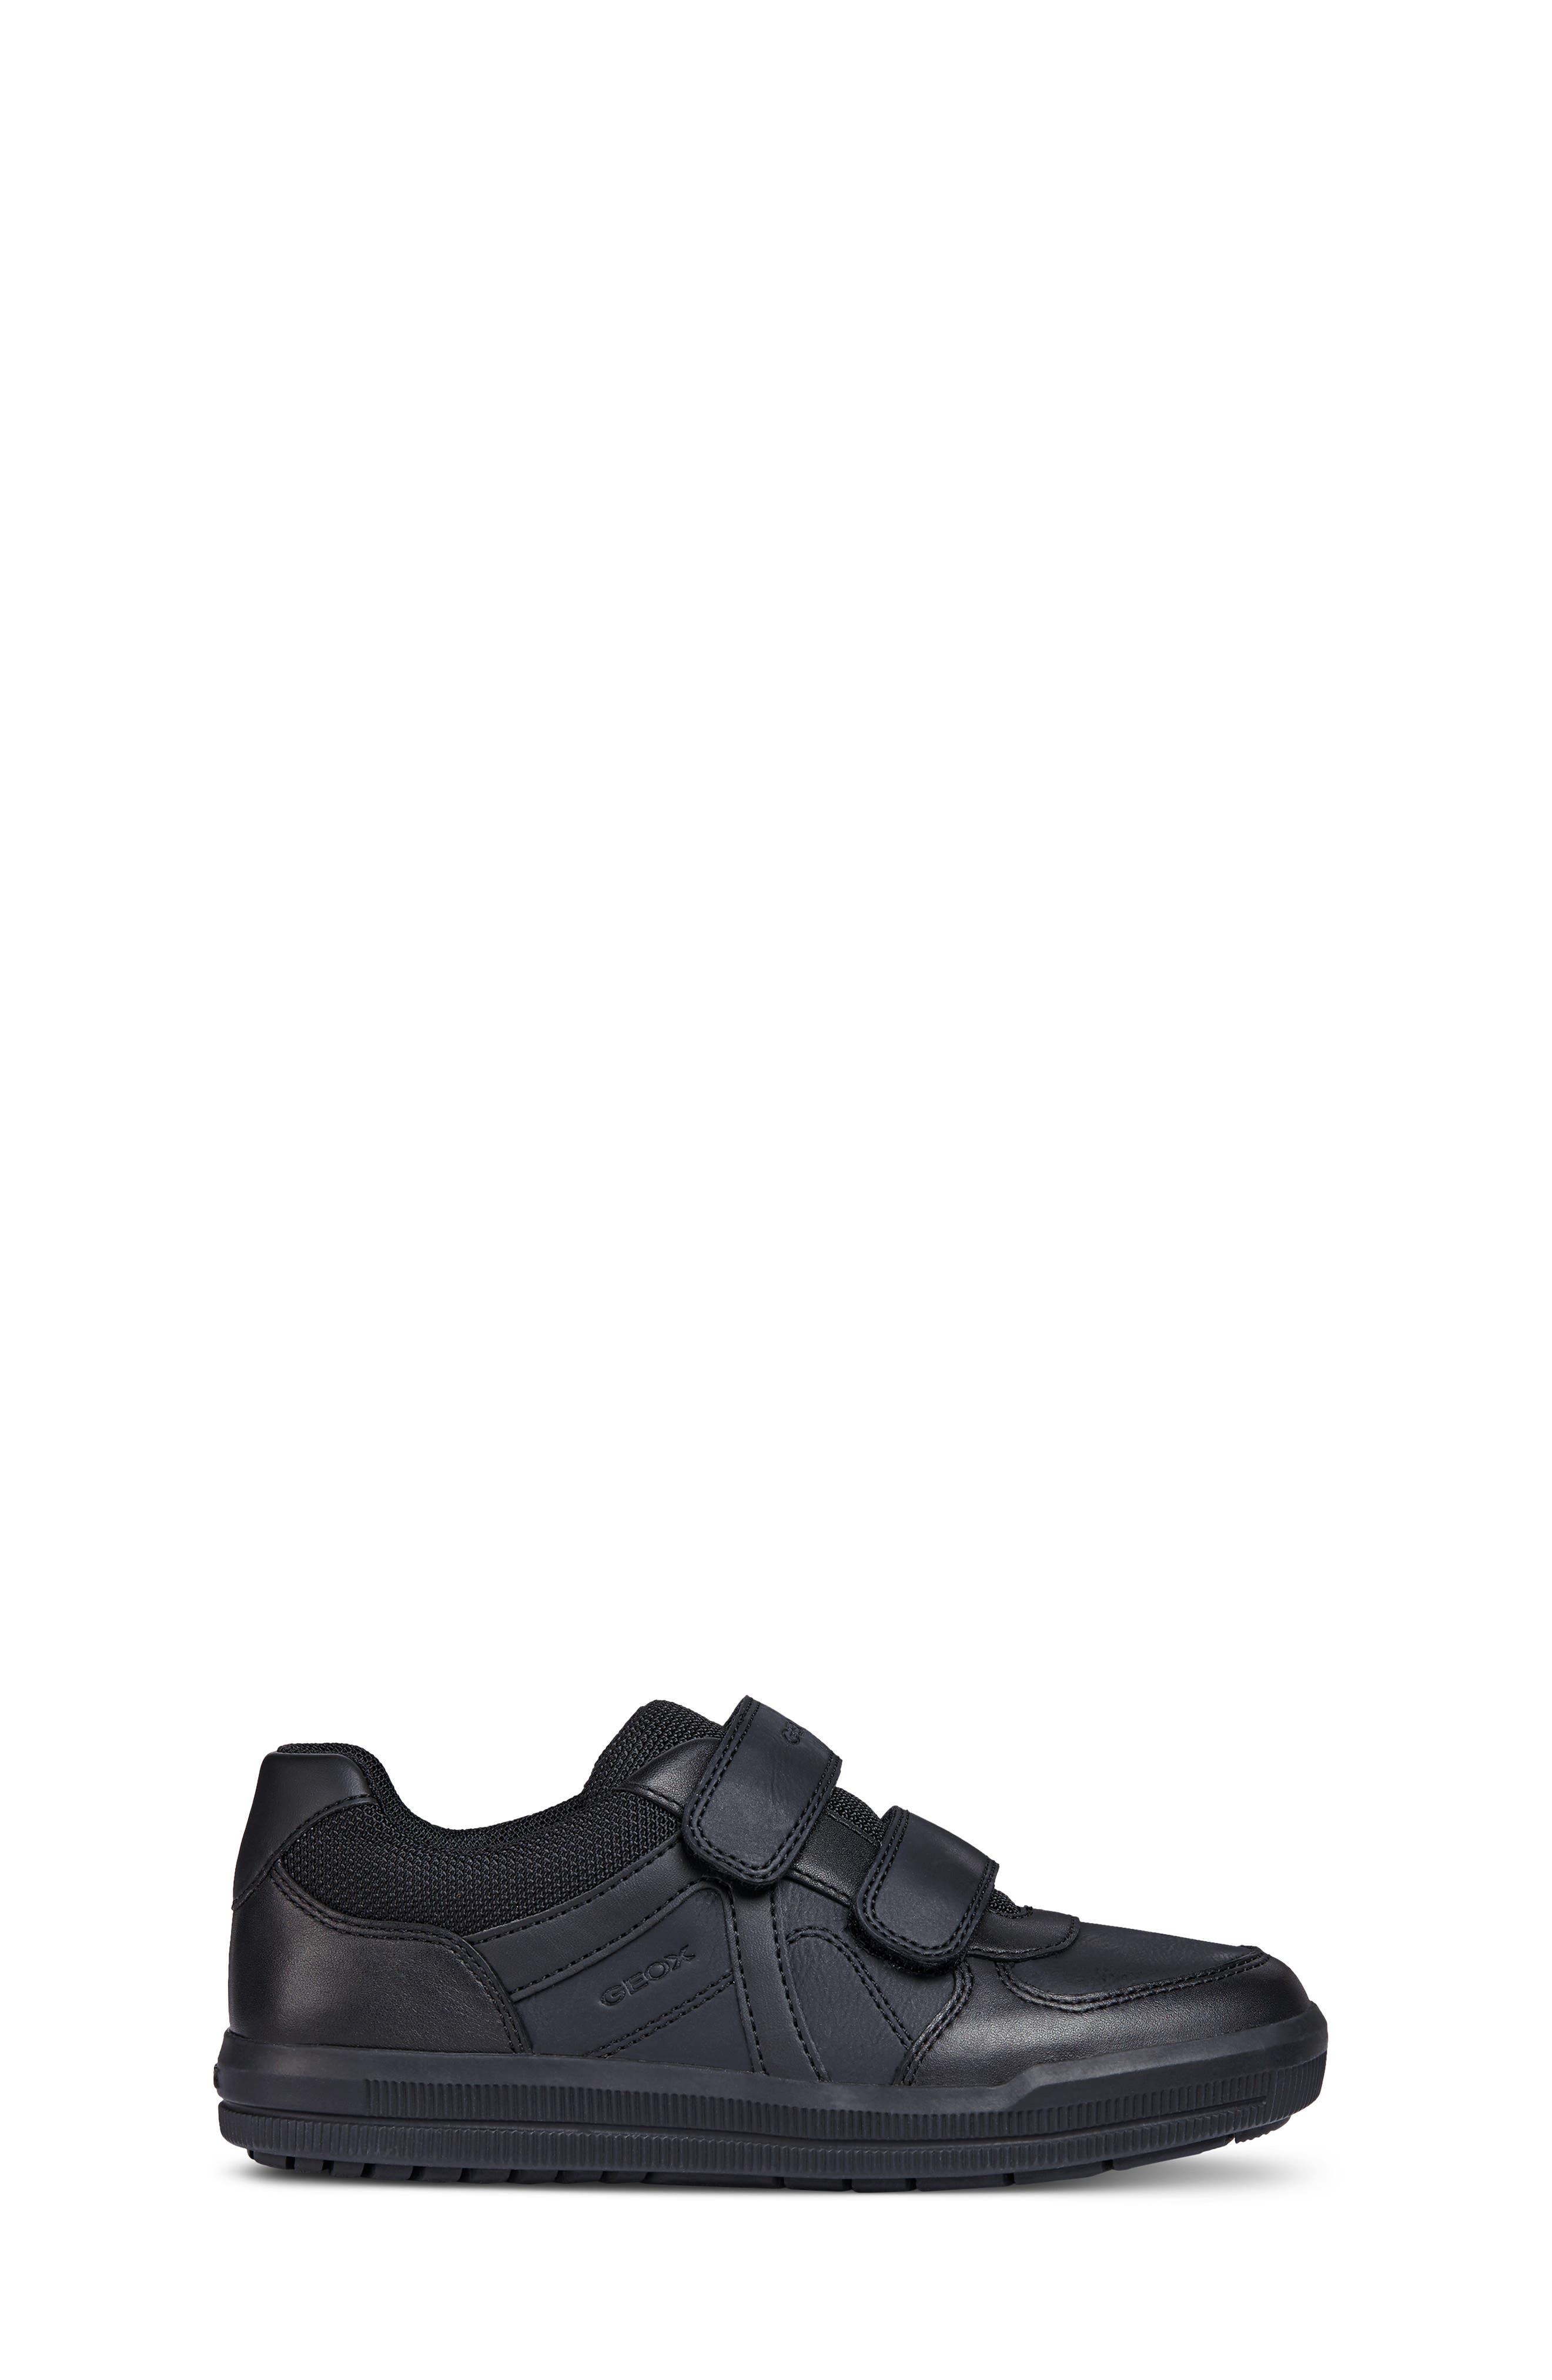 Arzach Sneaker,                             Alternate thumbnail 3, color,                             BLACK